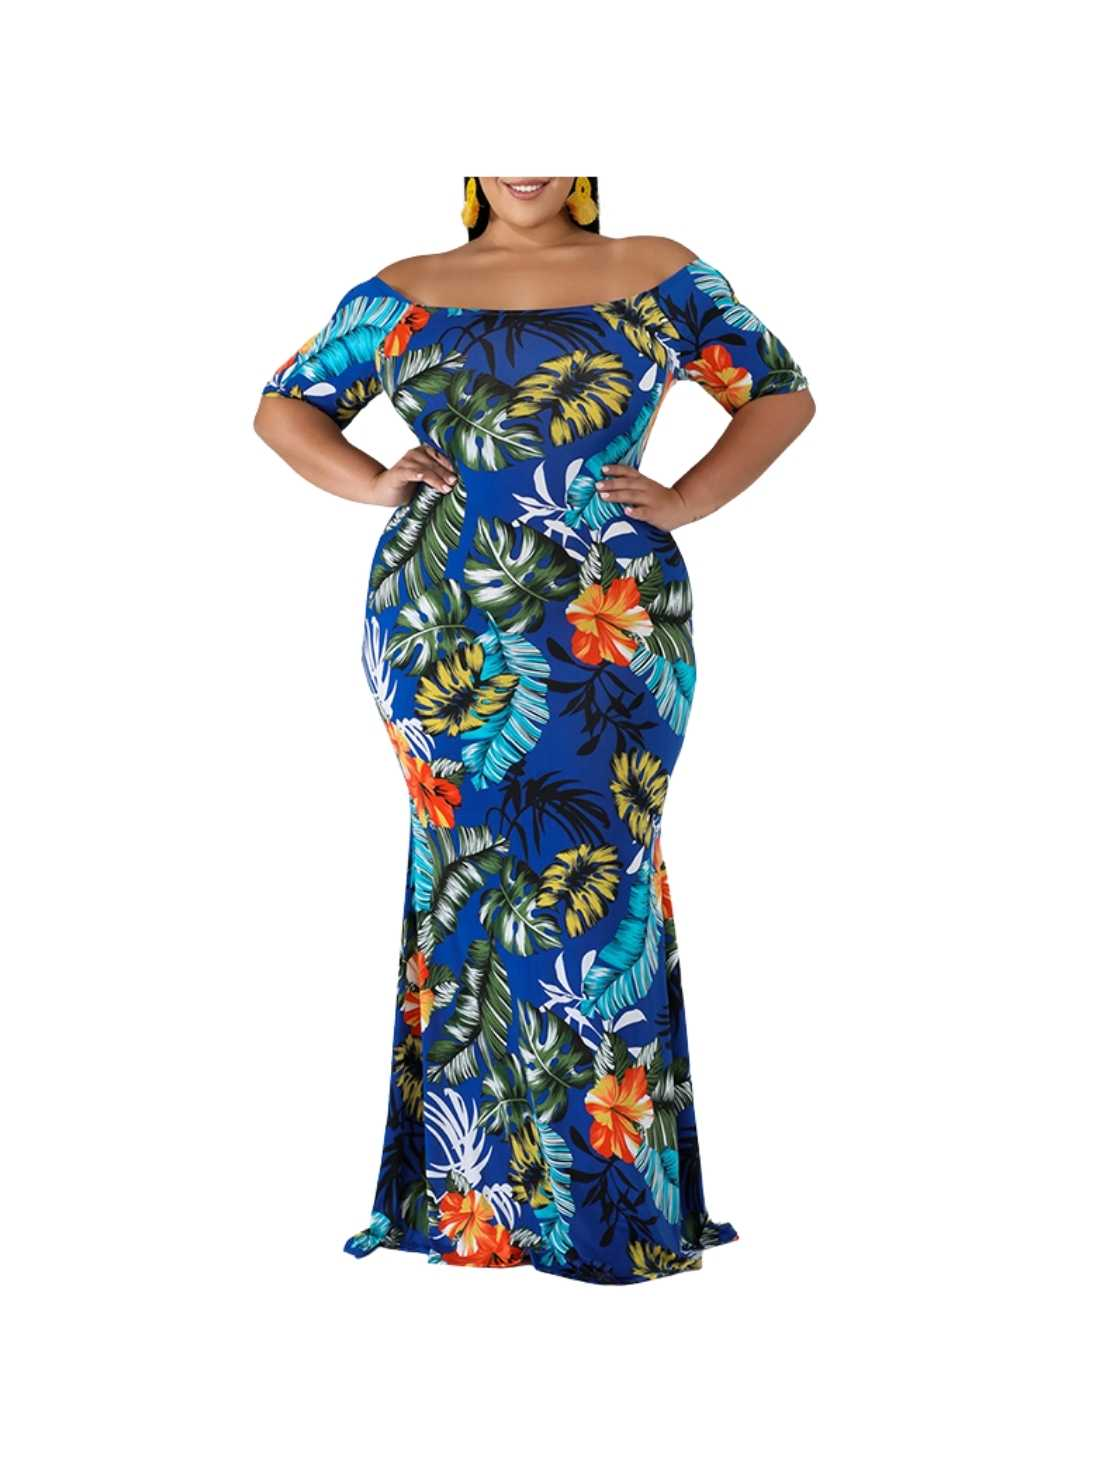 Plus Size Floral Off-Shoulder Dress